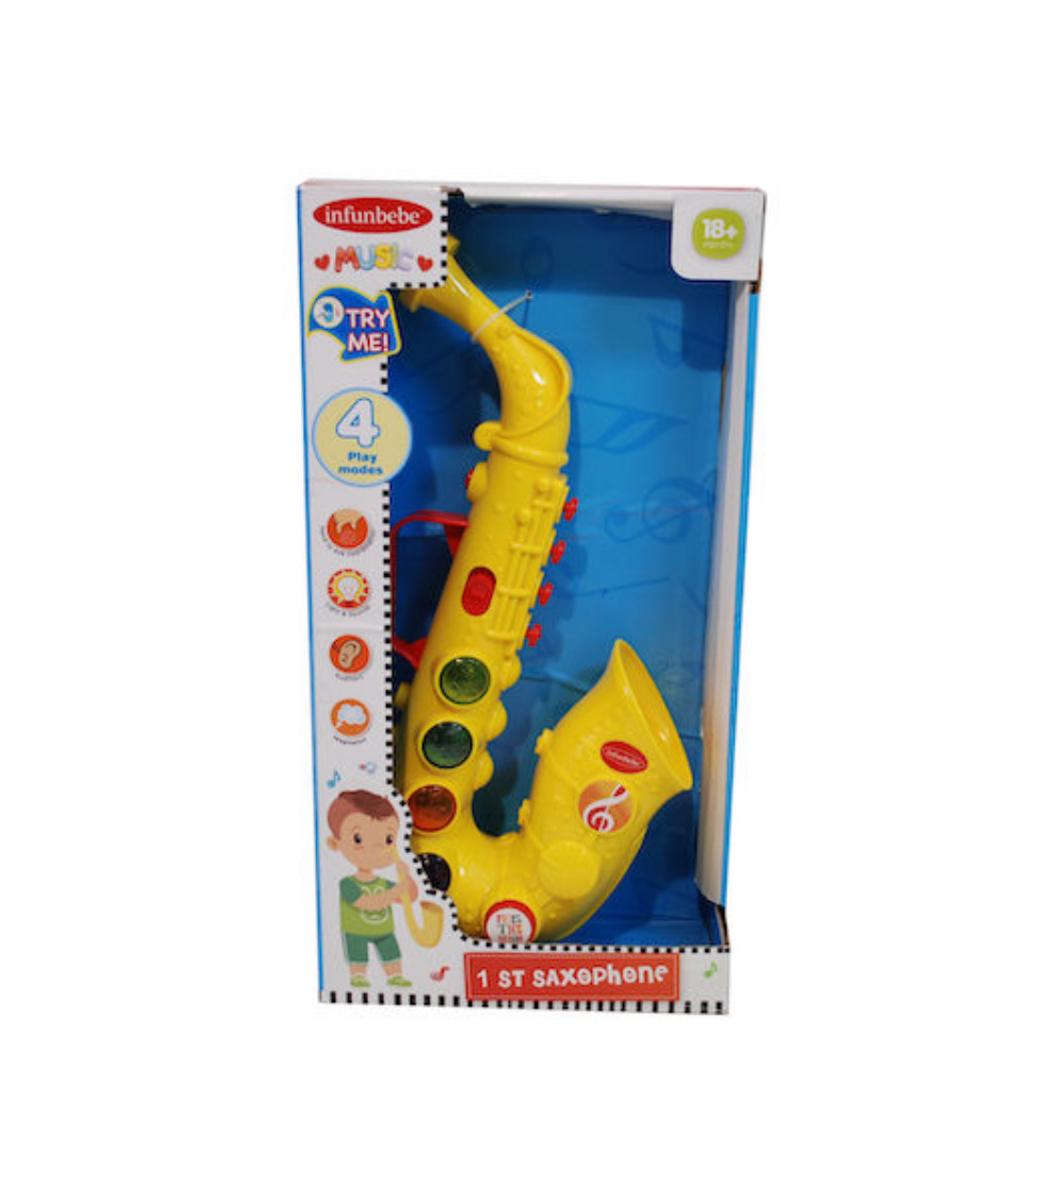 Infunbebe Saxofon 40cm